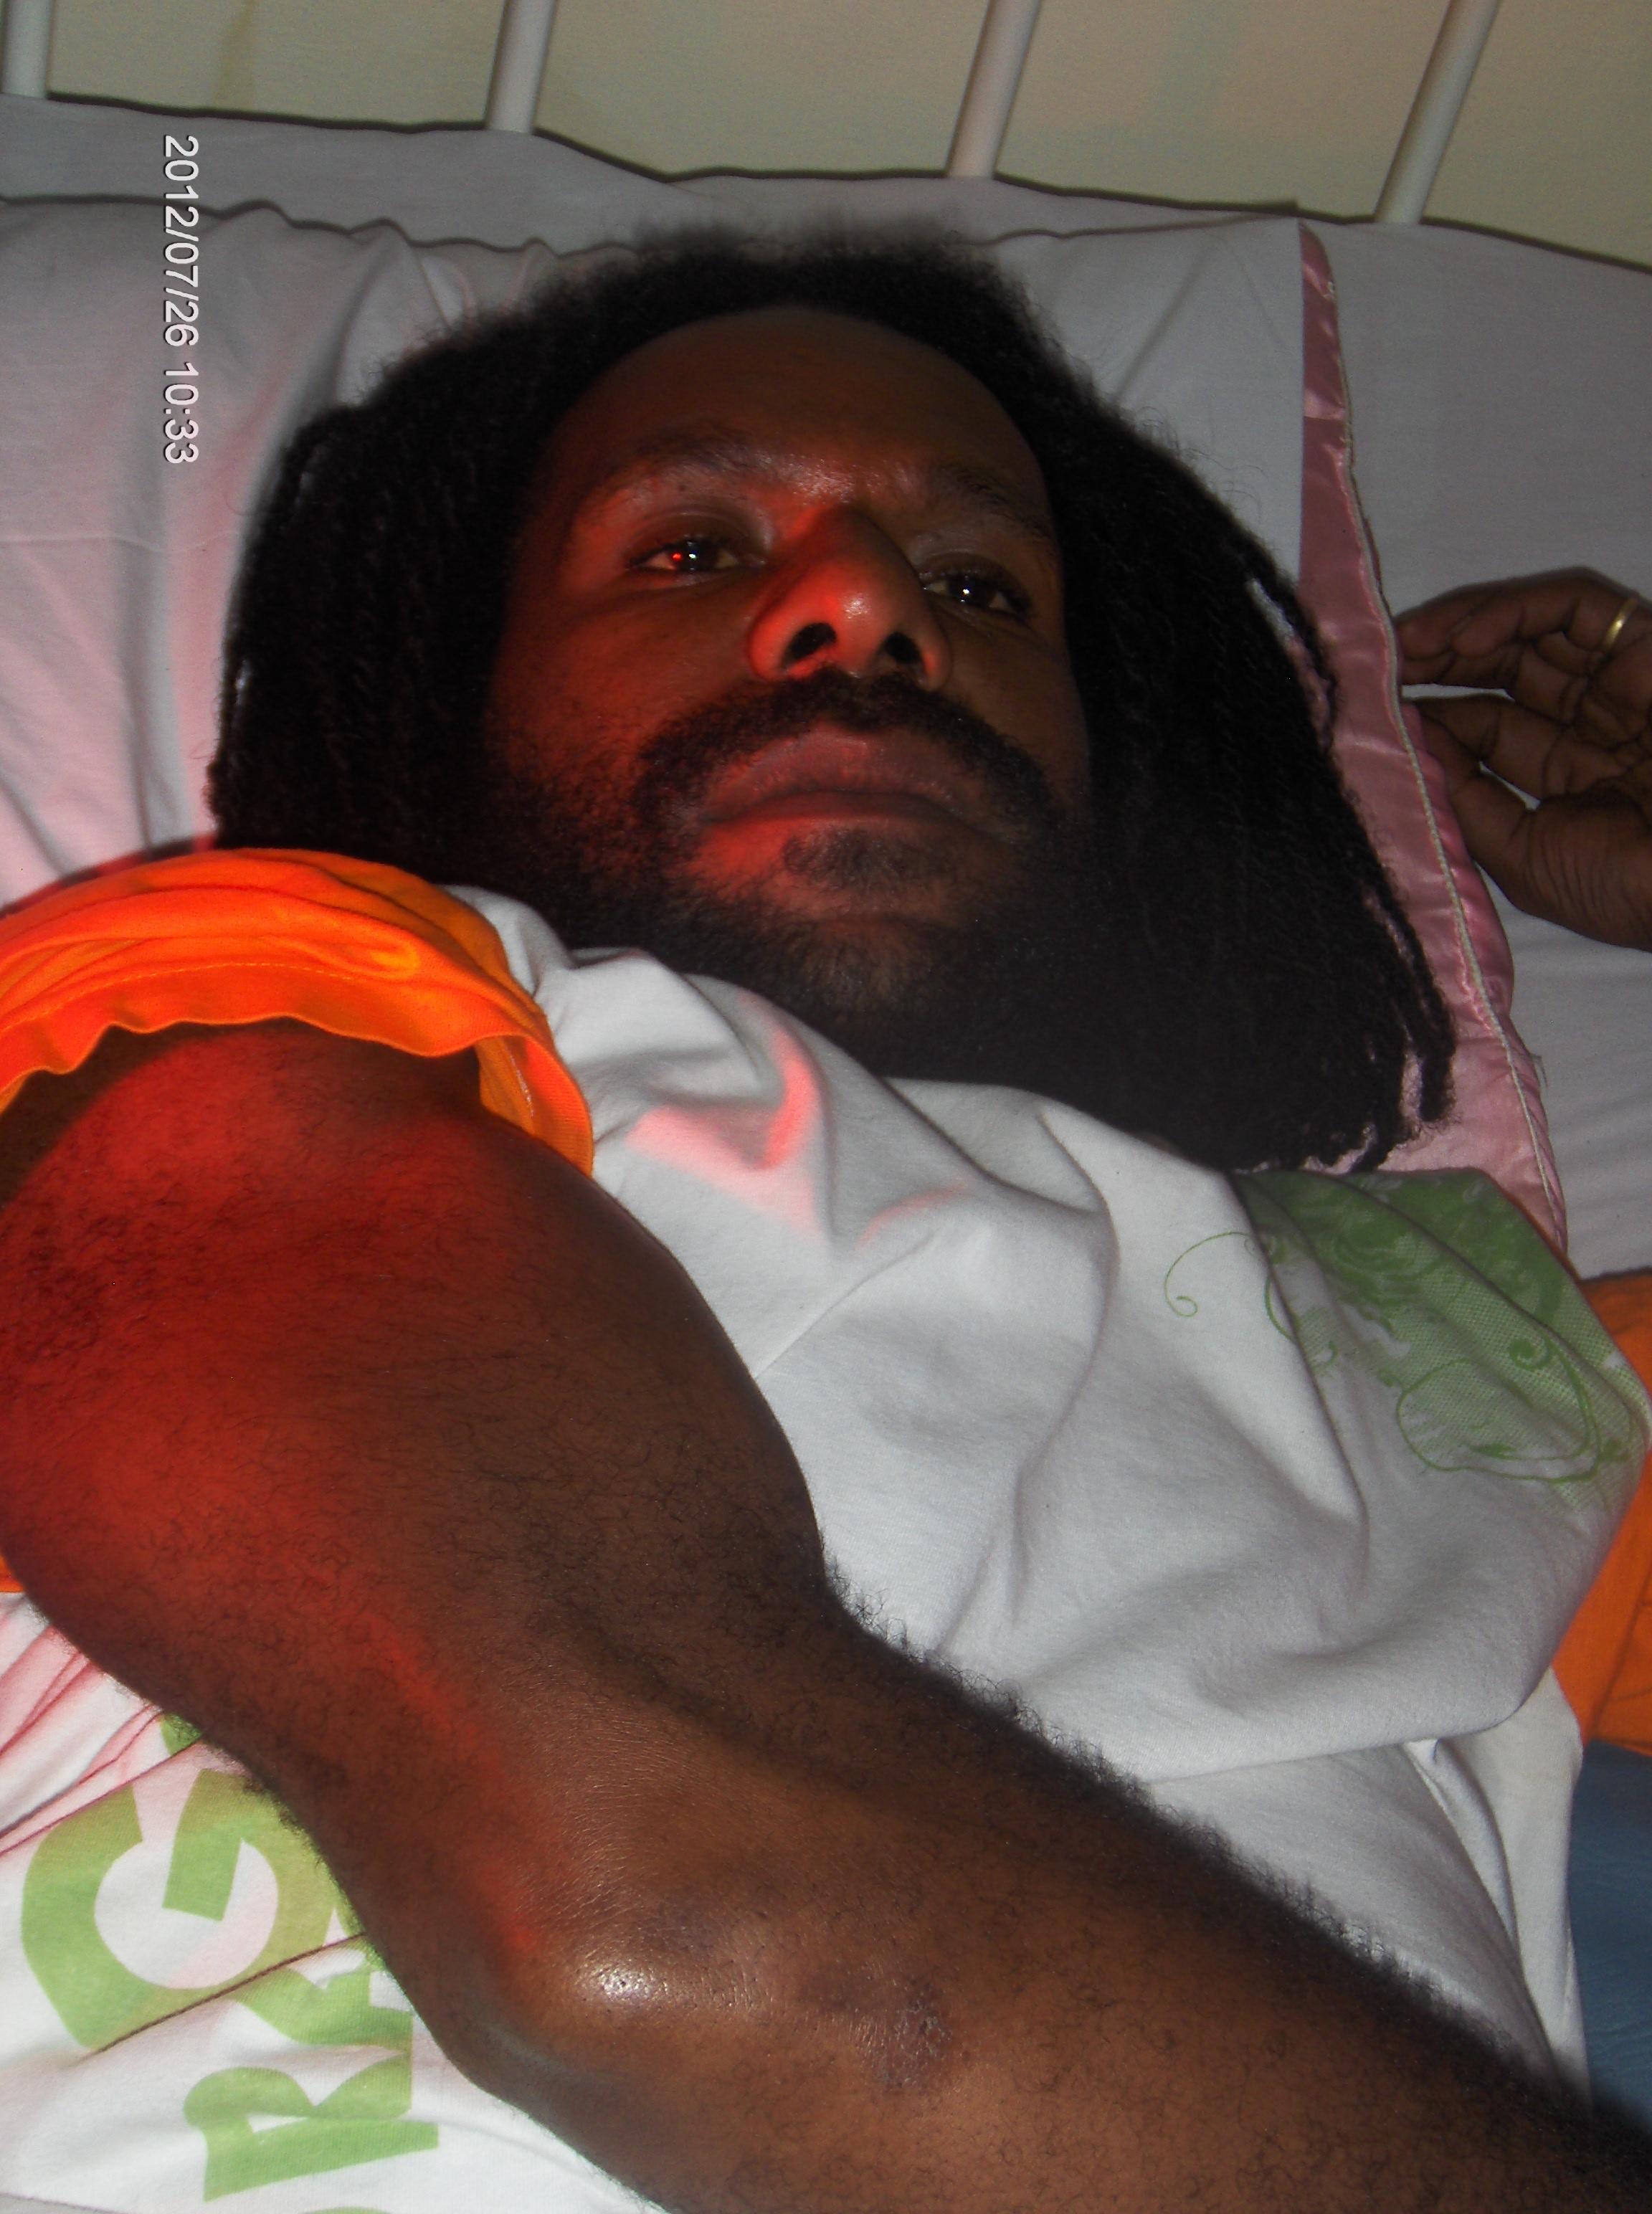 Jafrai Murib in hospital